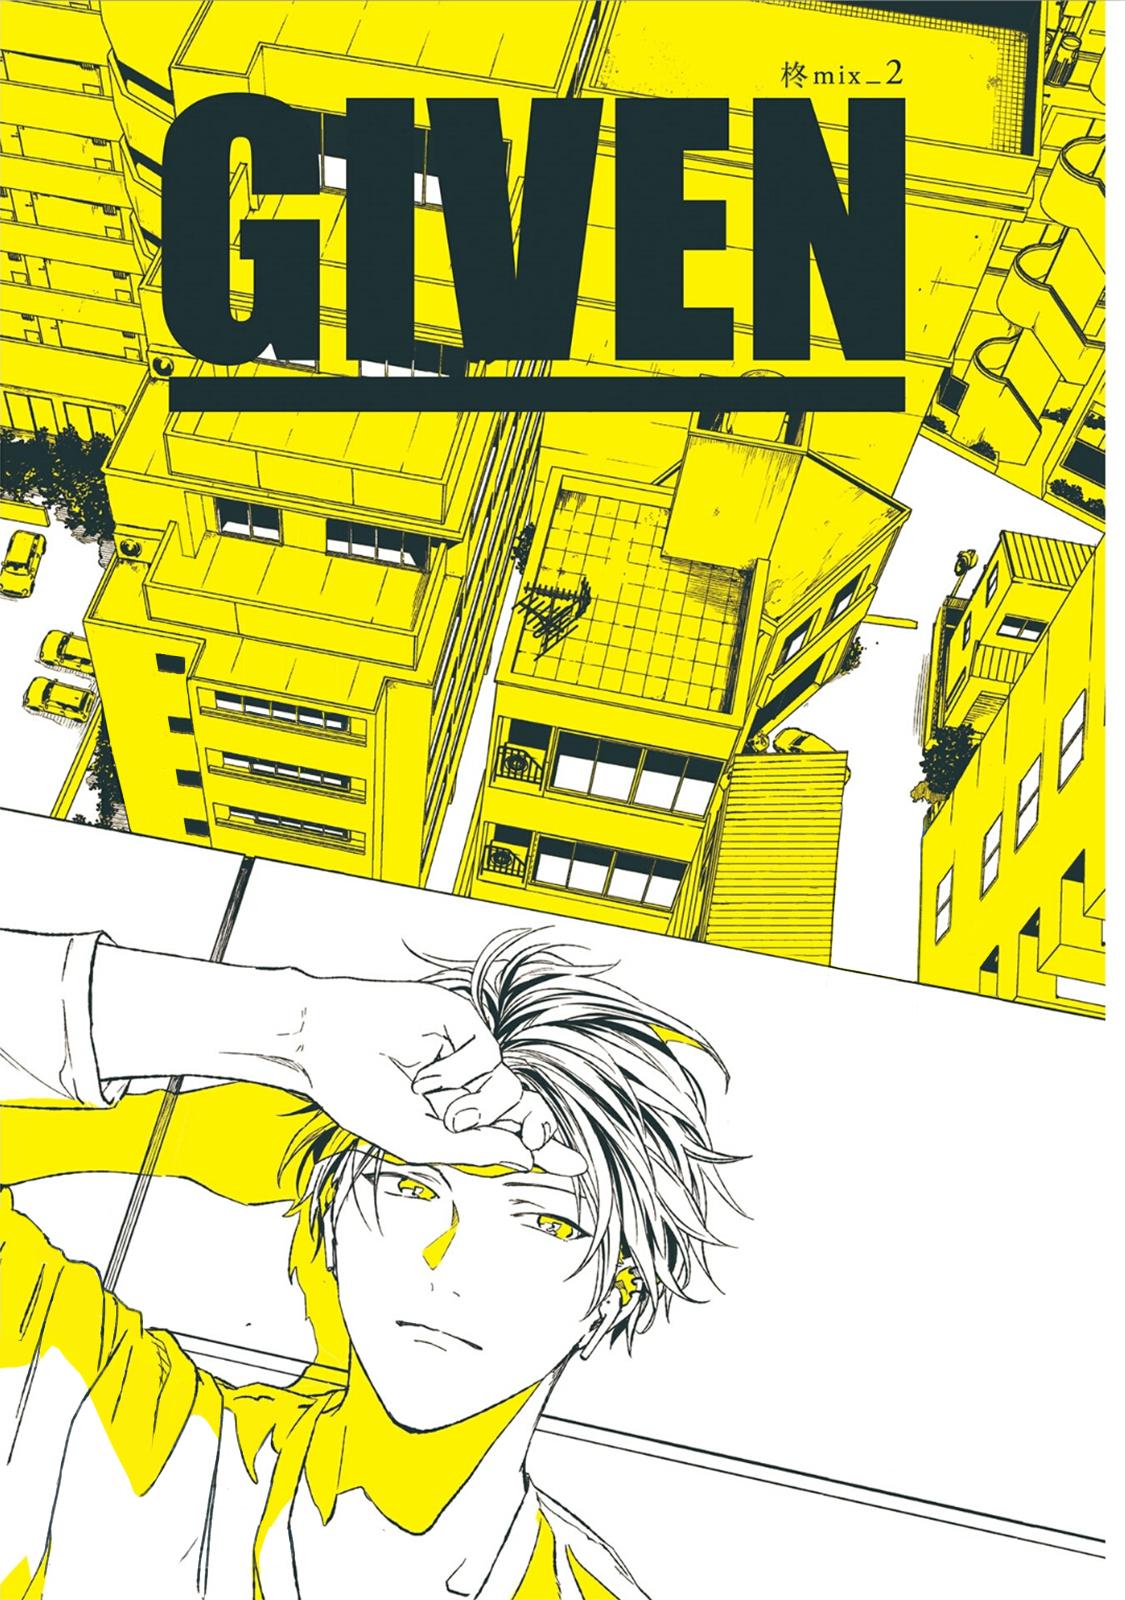 Release In 2020 Anime Wall Art Japanese Poster Design Cute Anime Wallpaper